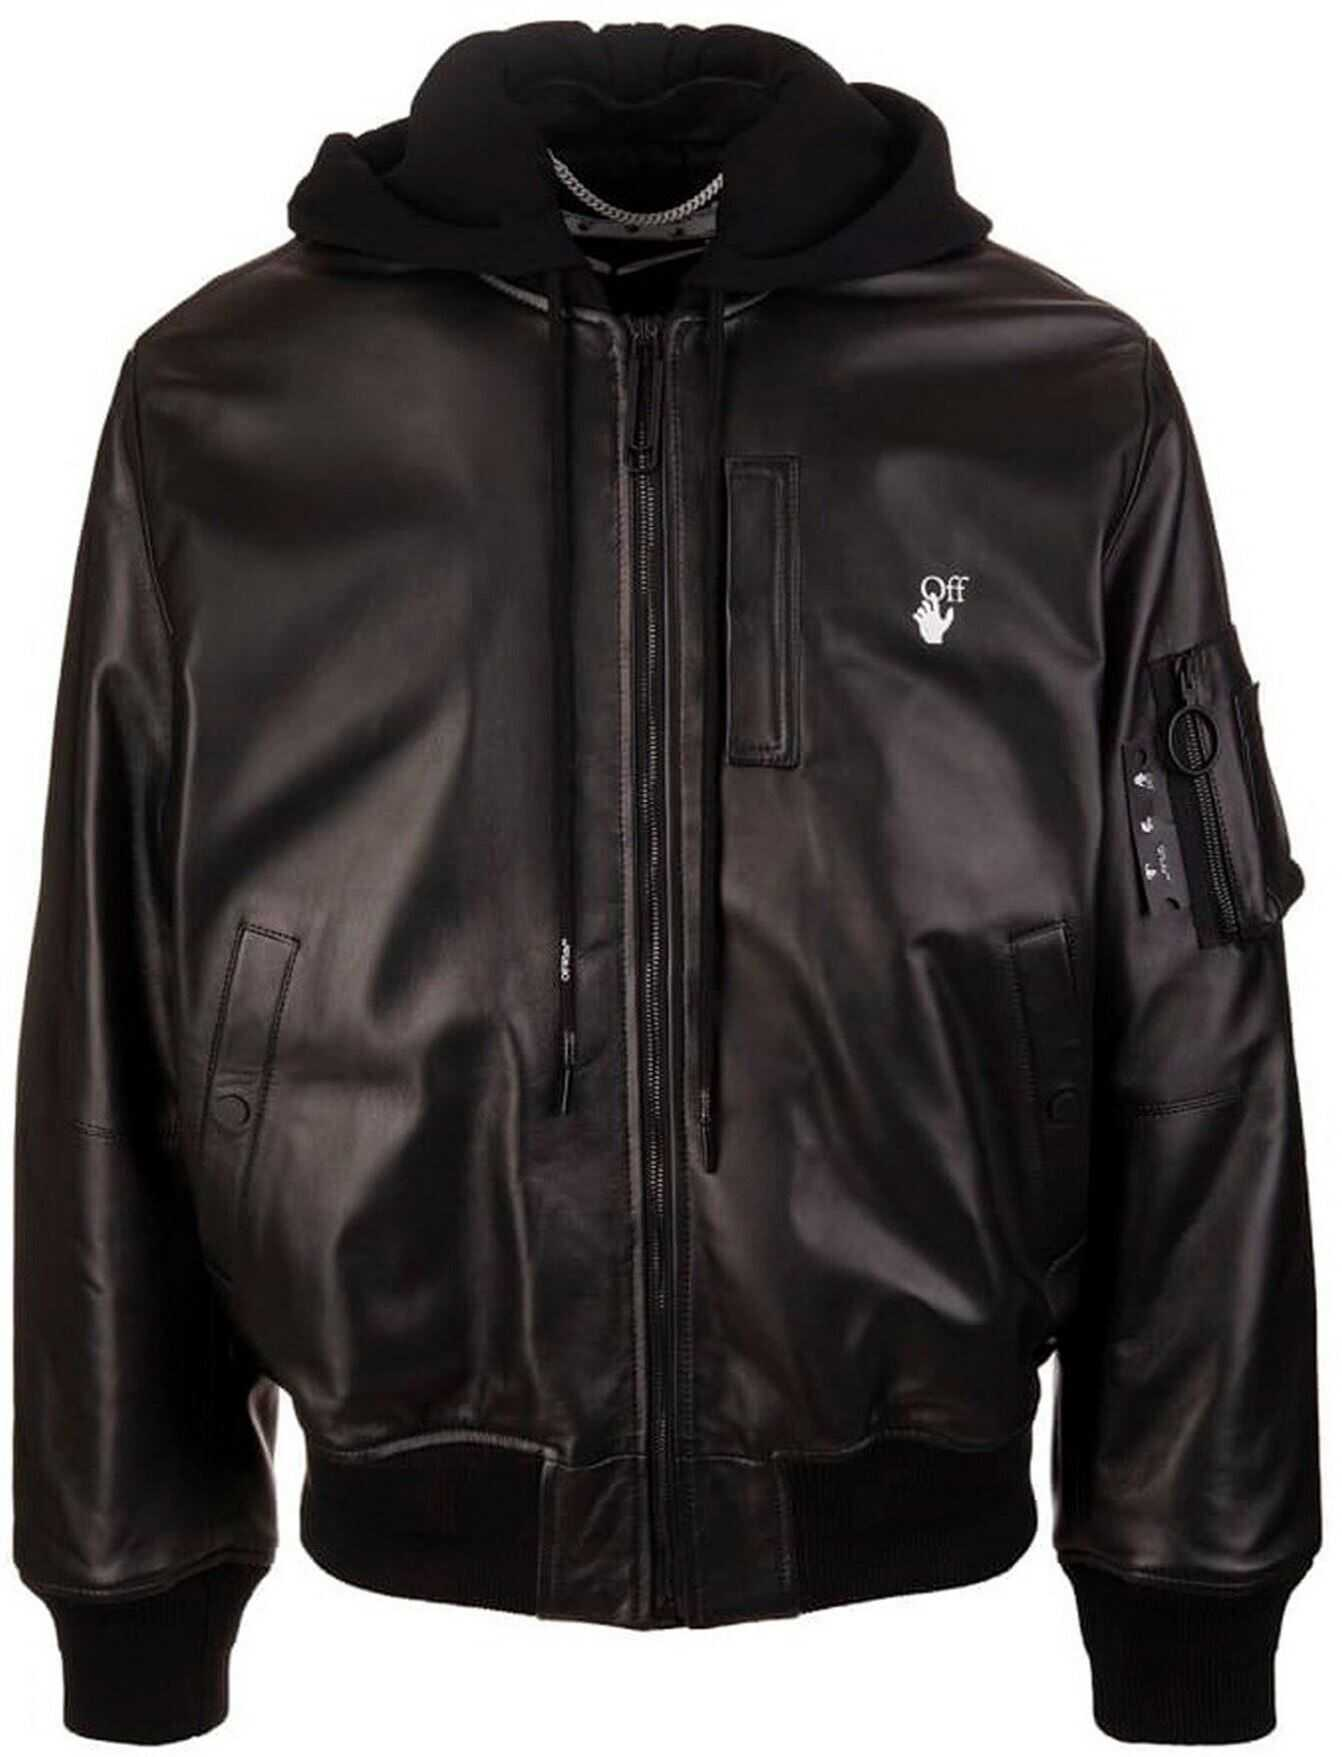 Off-White Arrow Leather Bomber Jacket In Black Black imagine